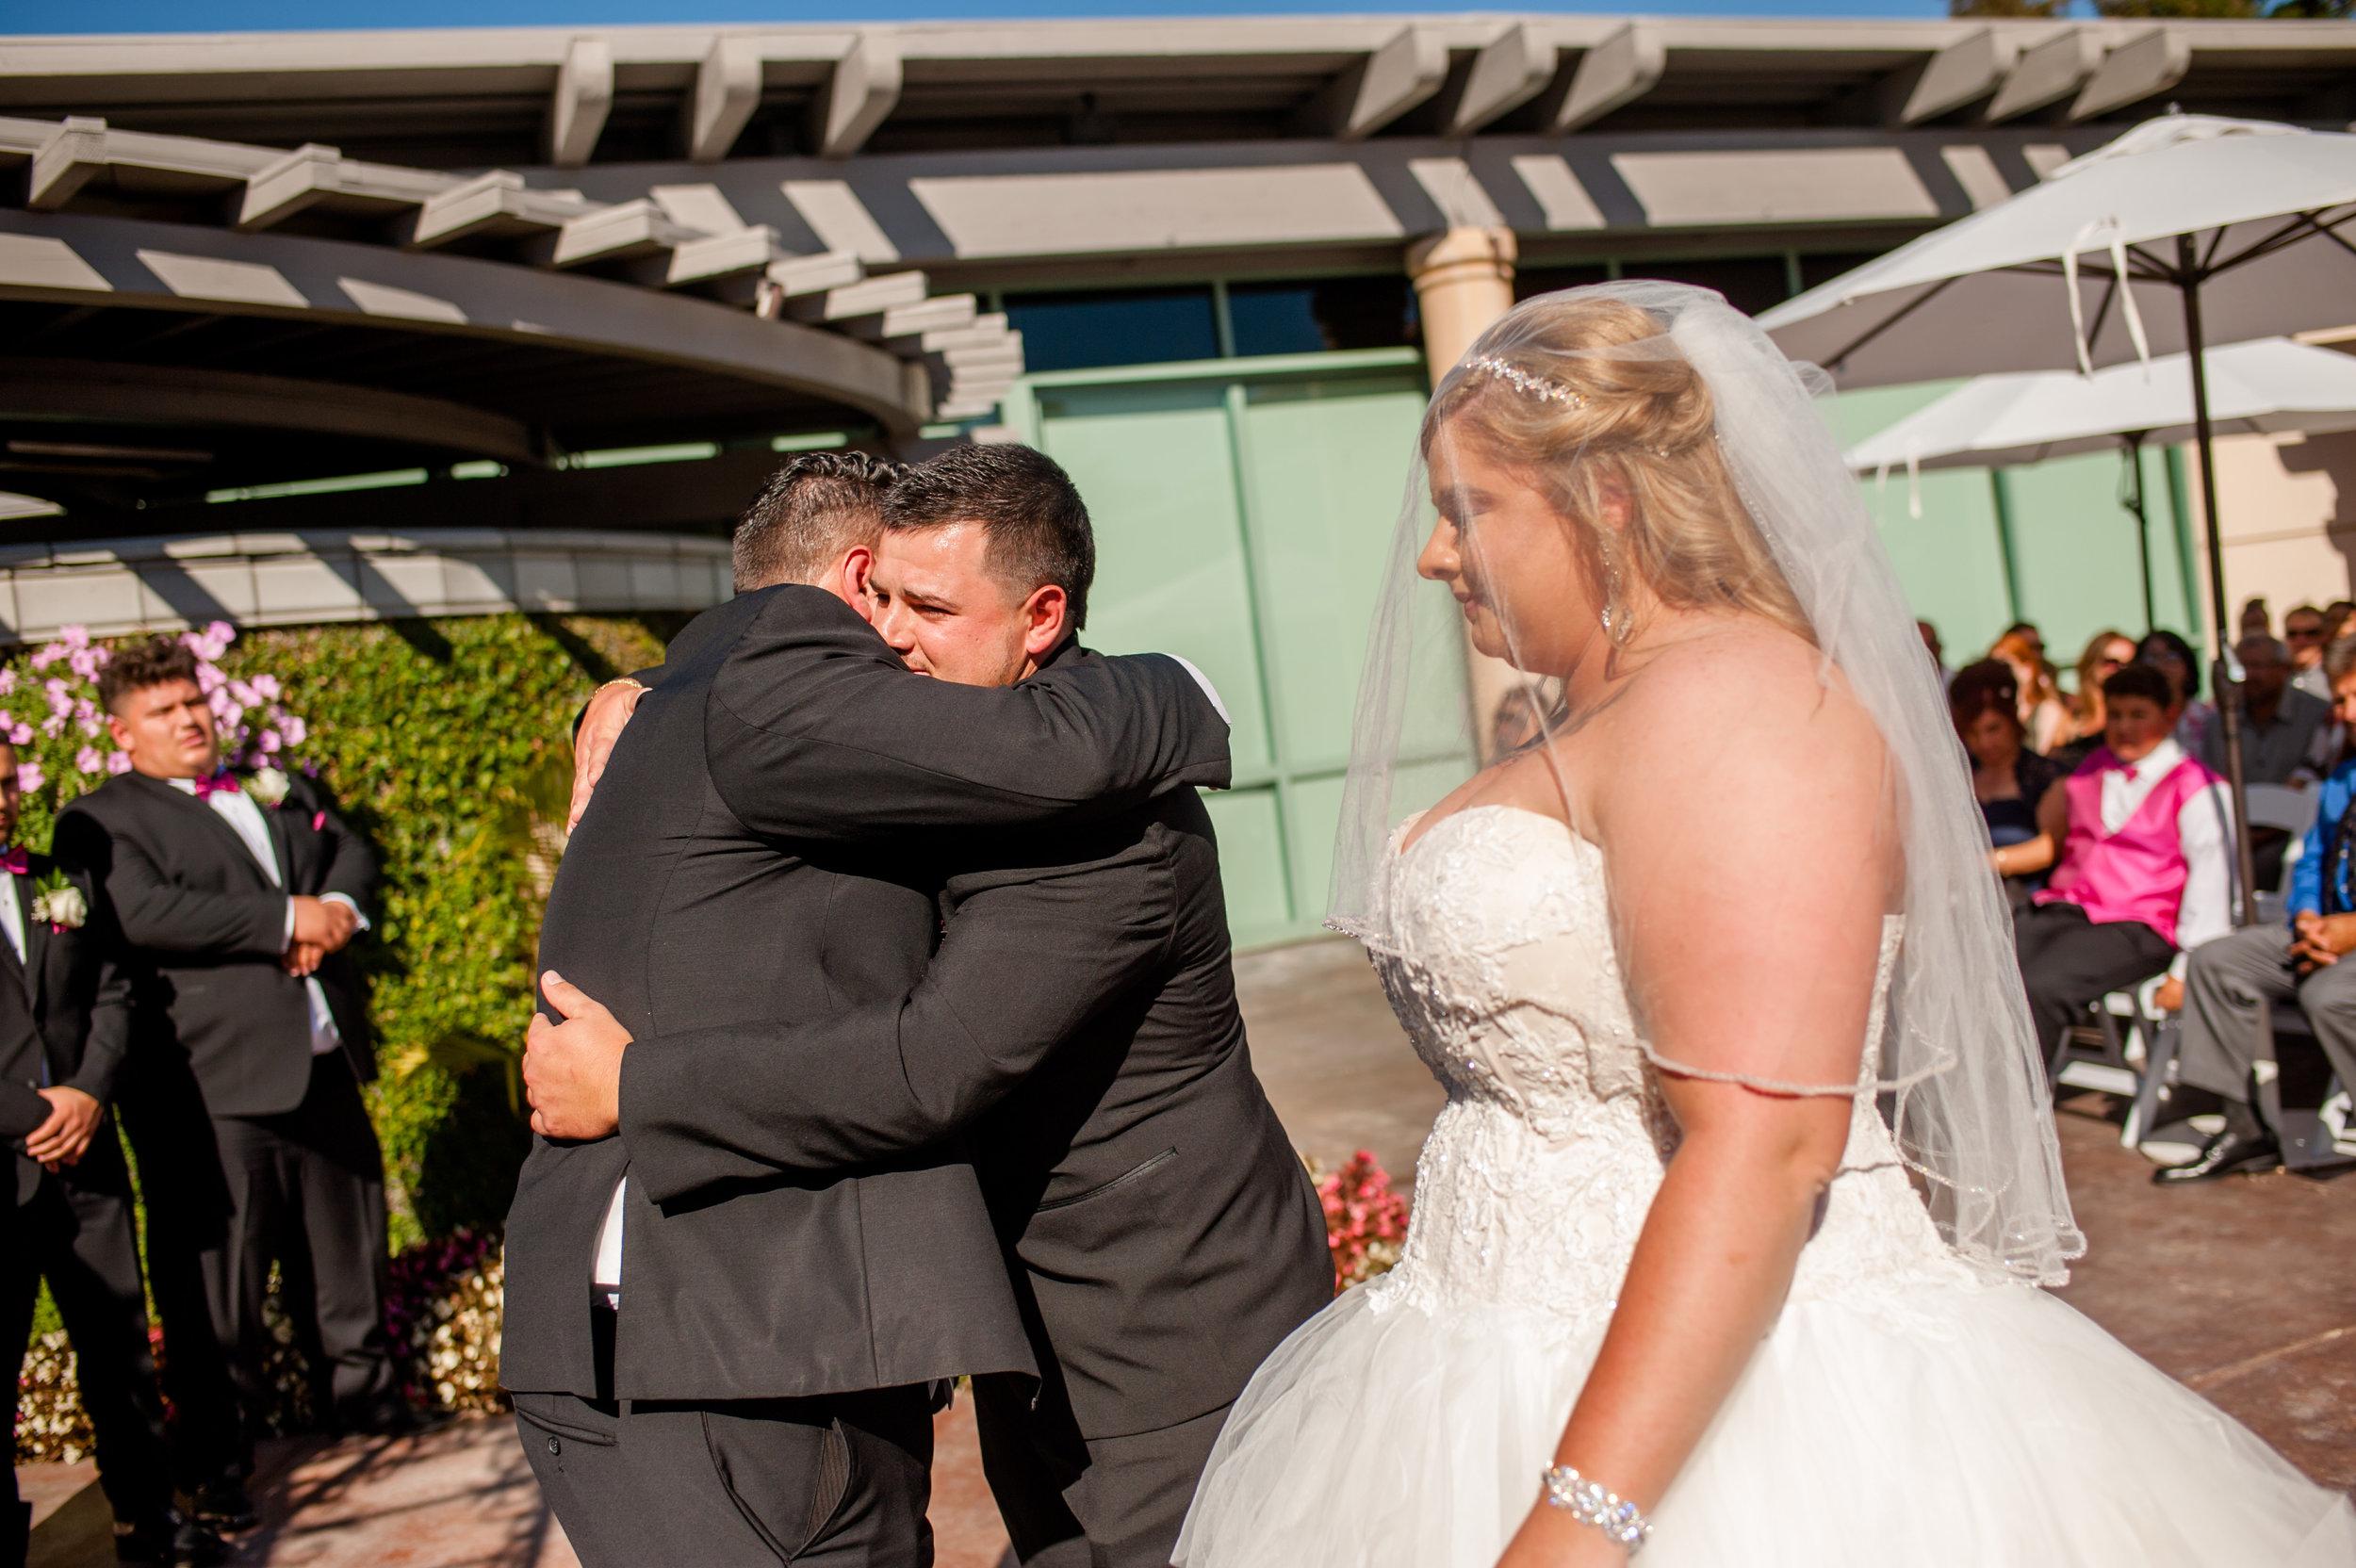 lyndzie-javier-014-arden-hills-sacramento-wedding-photographer-katherine-nicole-photography.JPG